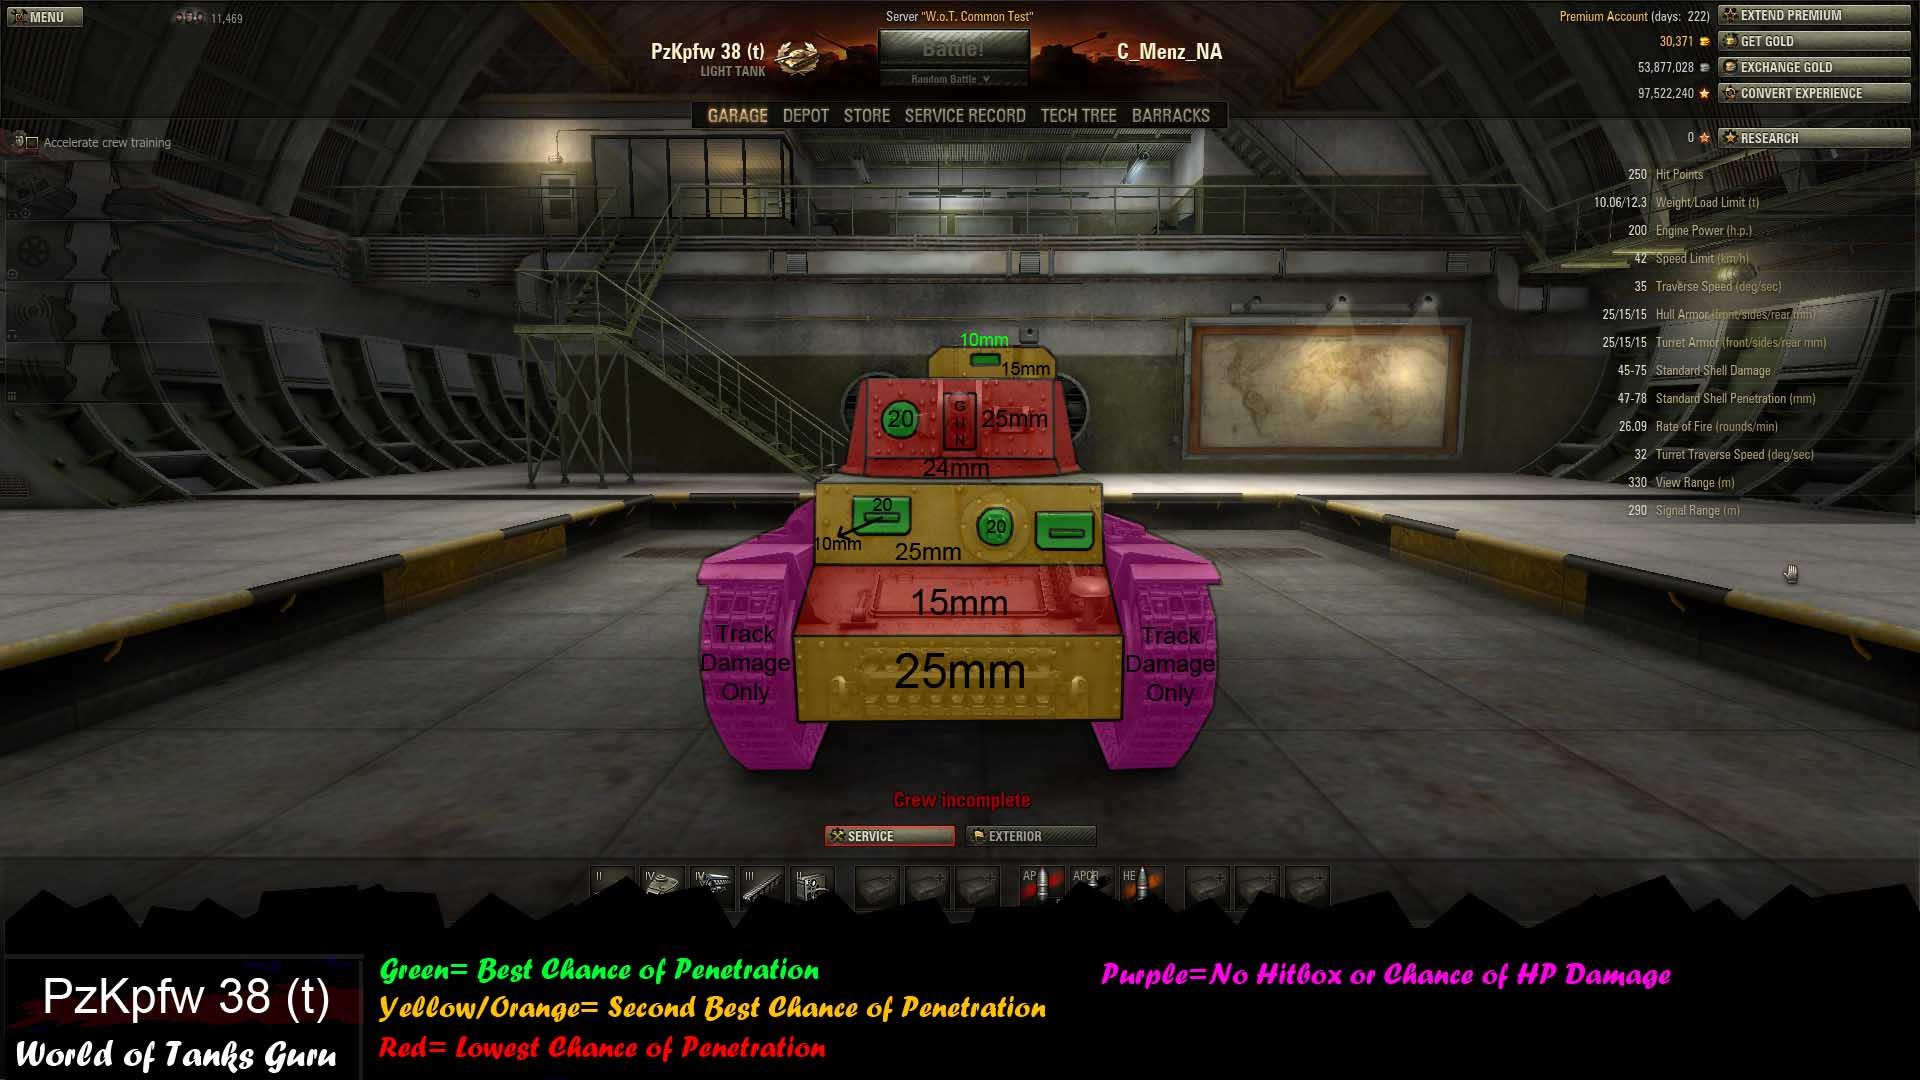 Weak Spot Guide: PzKpfw 38 (t) - World of Tanks